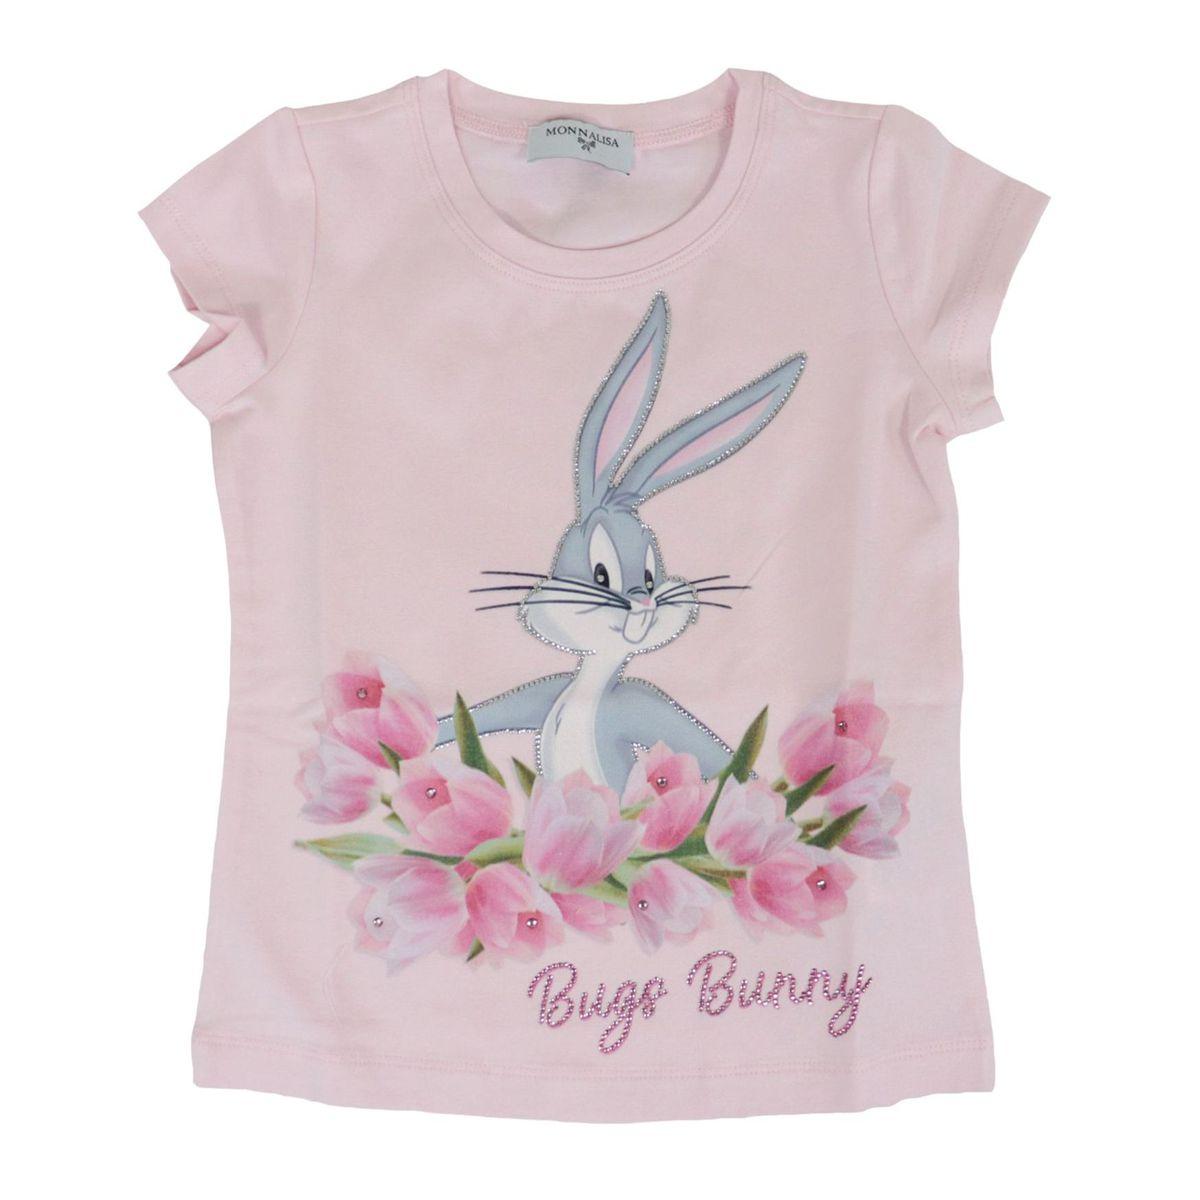 Jersey T-shirt with Bugs Bunny print and rhinestone applications Rose Monnalisa